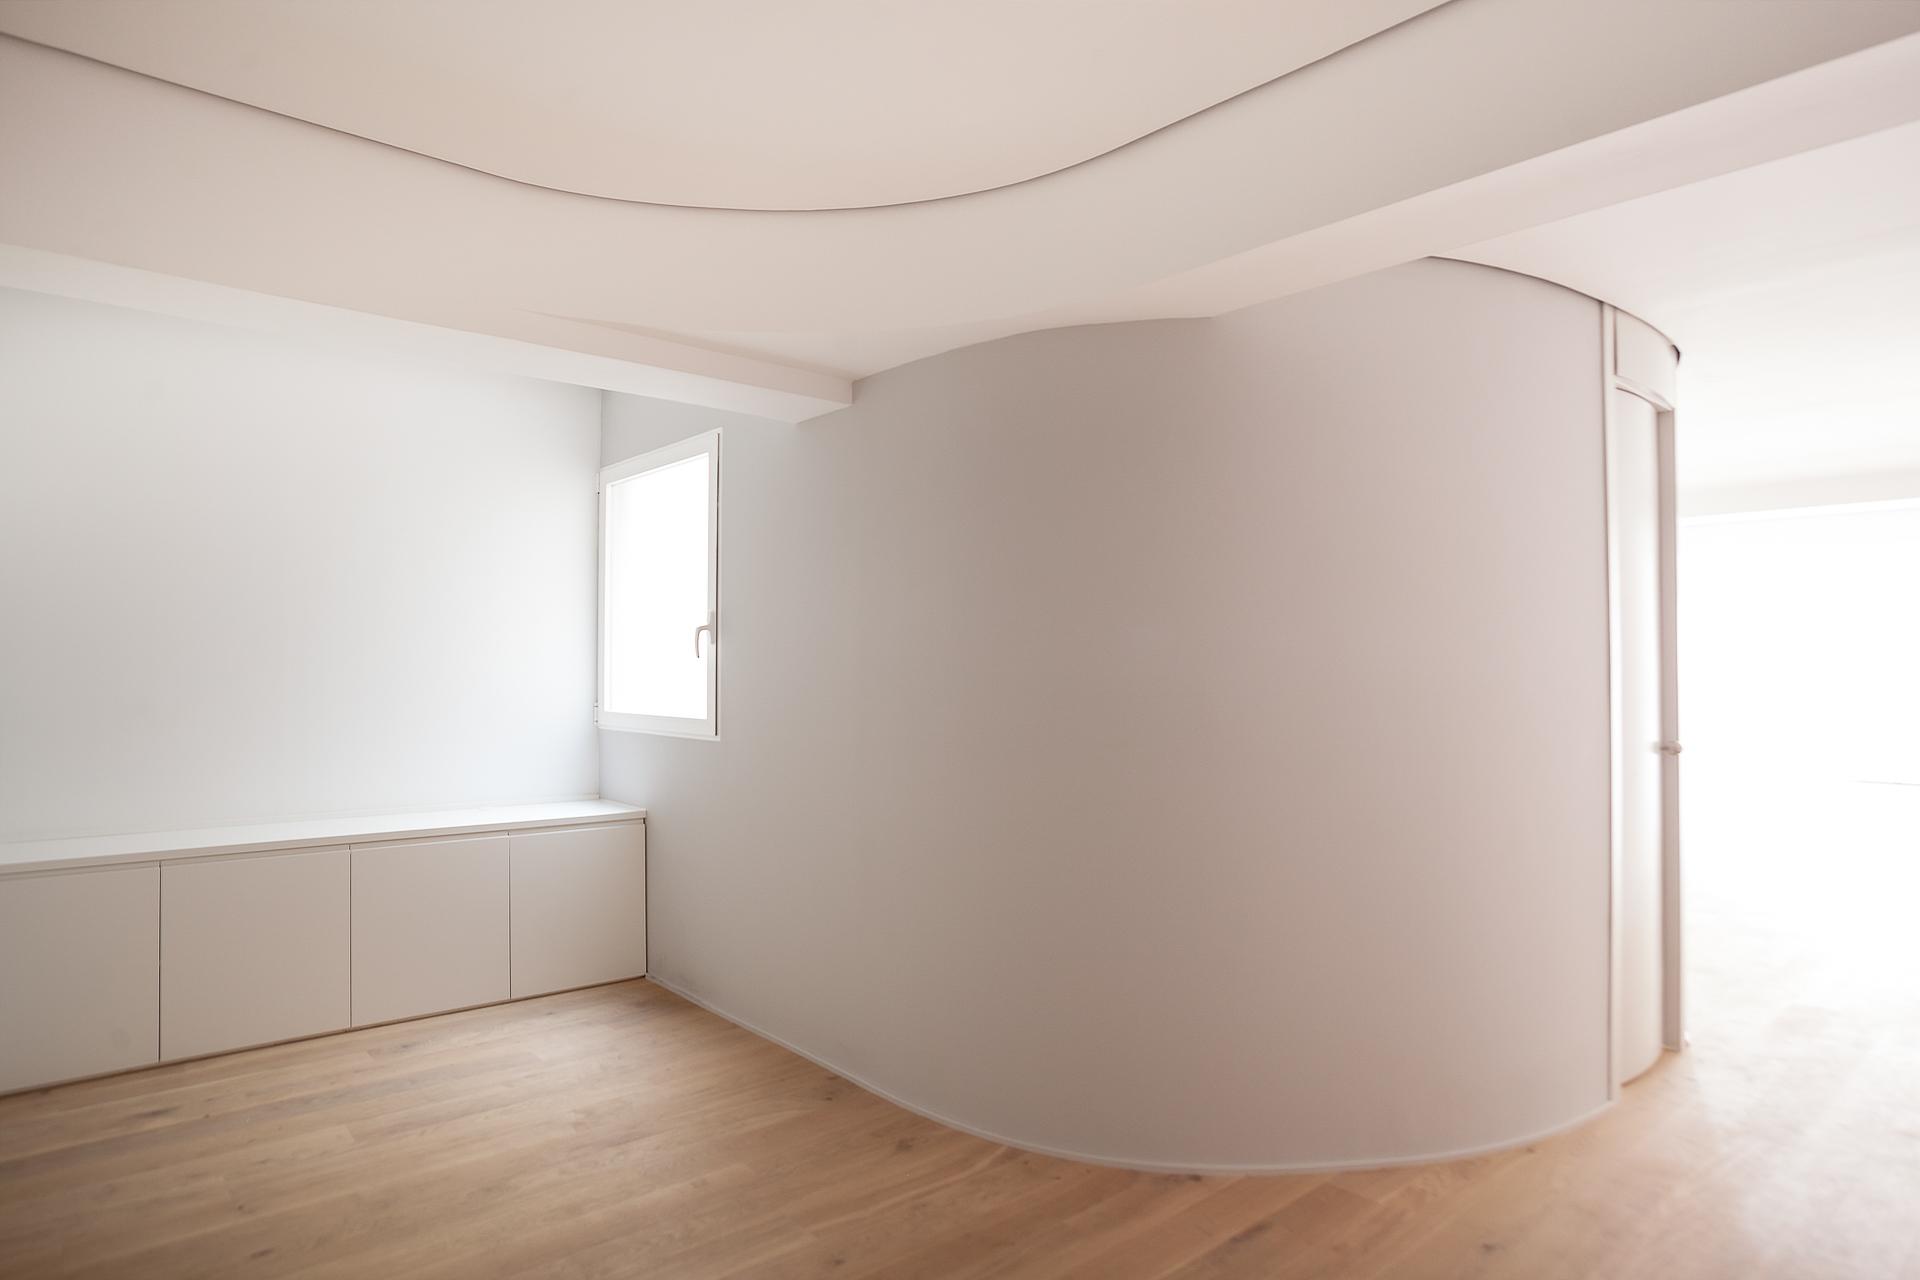 LAGASCA_Maroto_Ibañez_arquitectos02